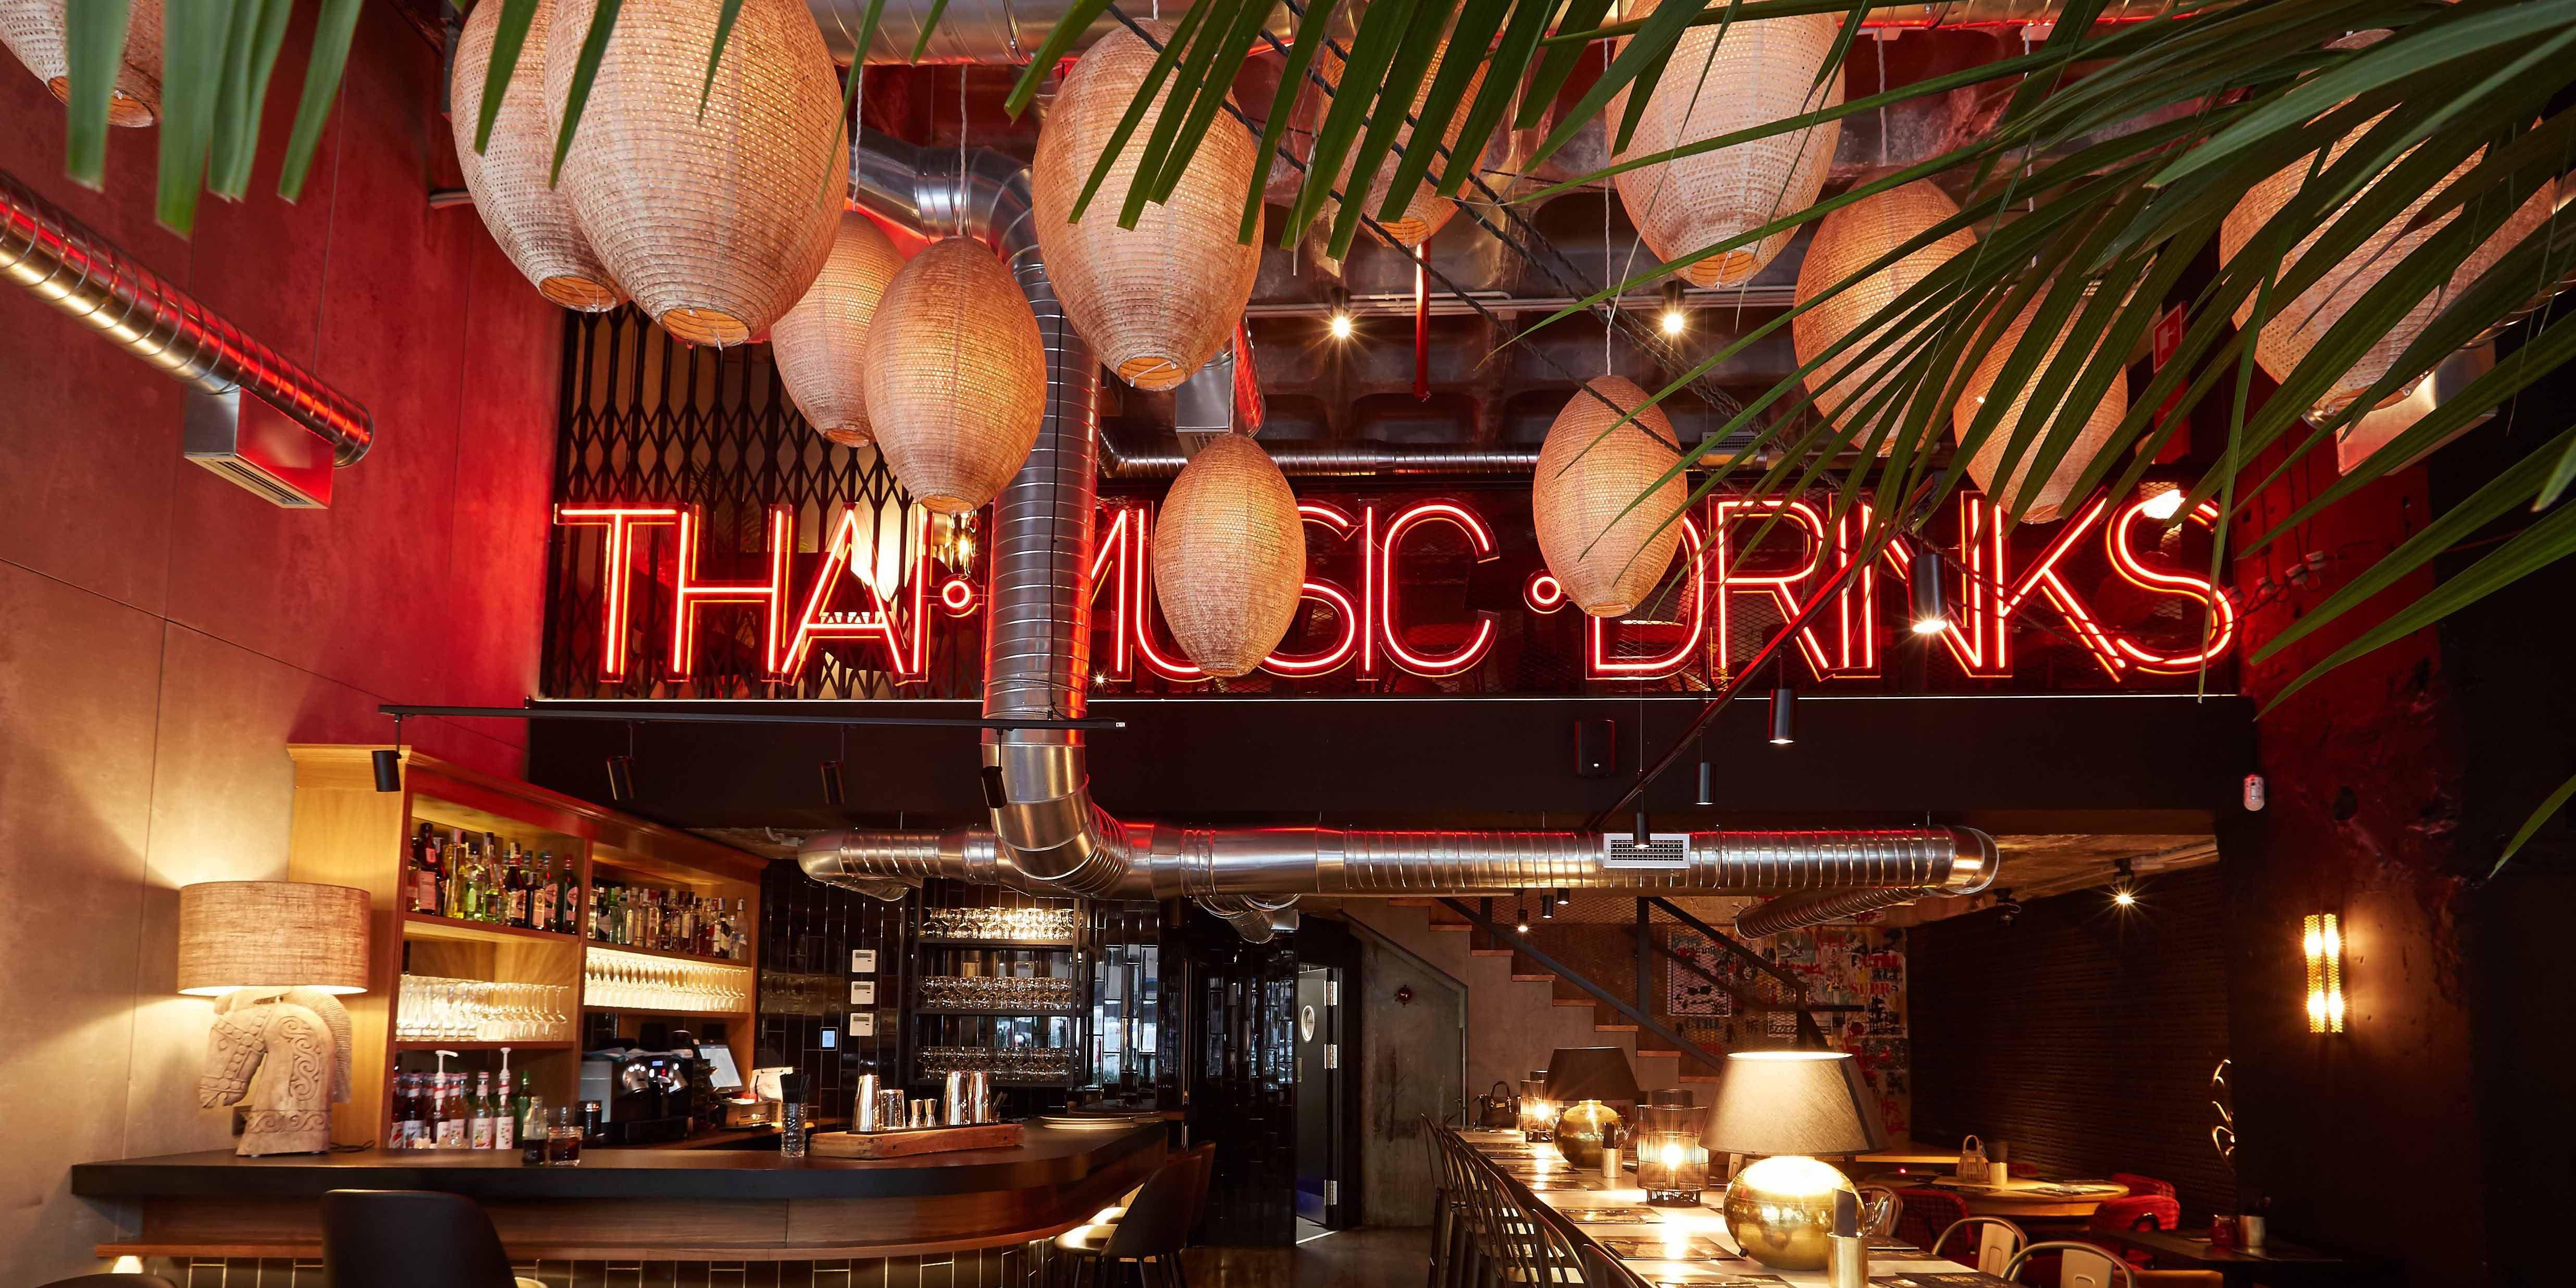 Bang Cook, restaurante tailandés en Madrid